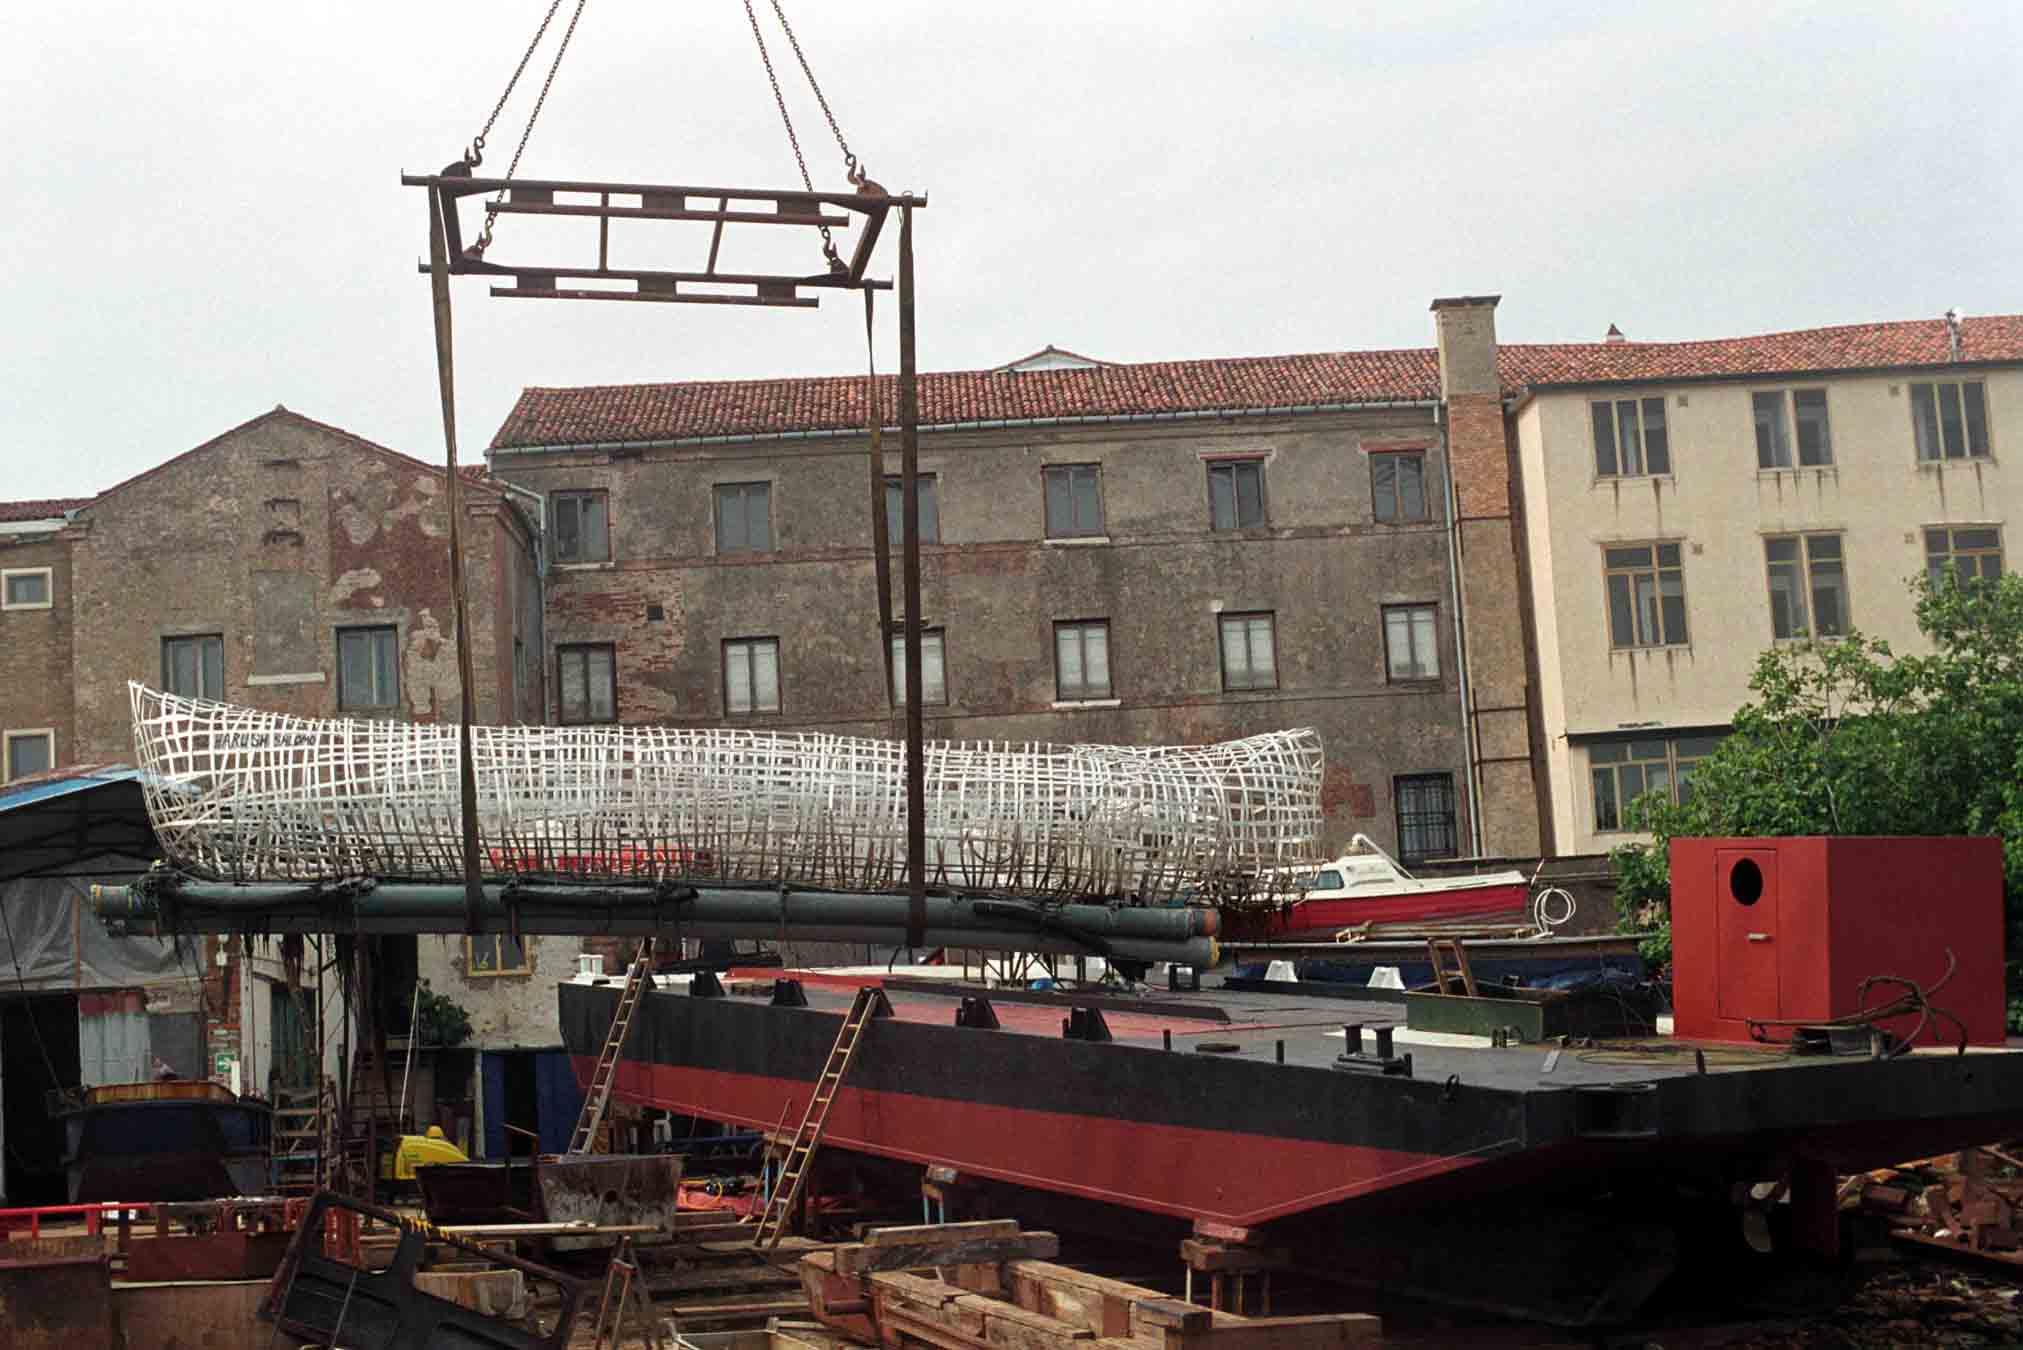 Boatless ,2005